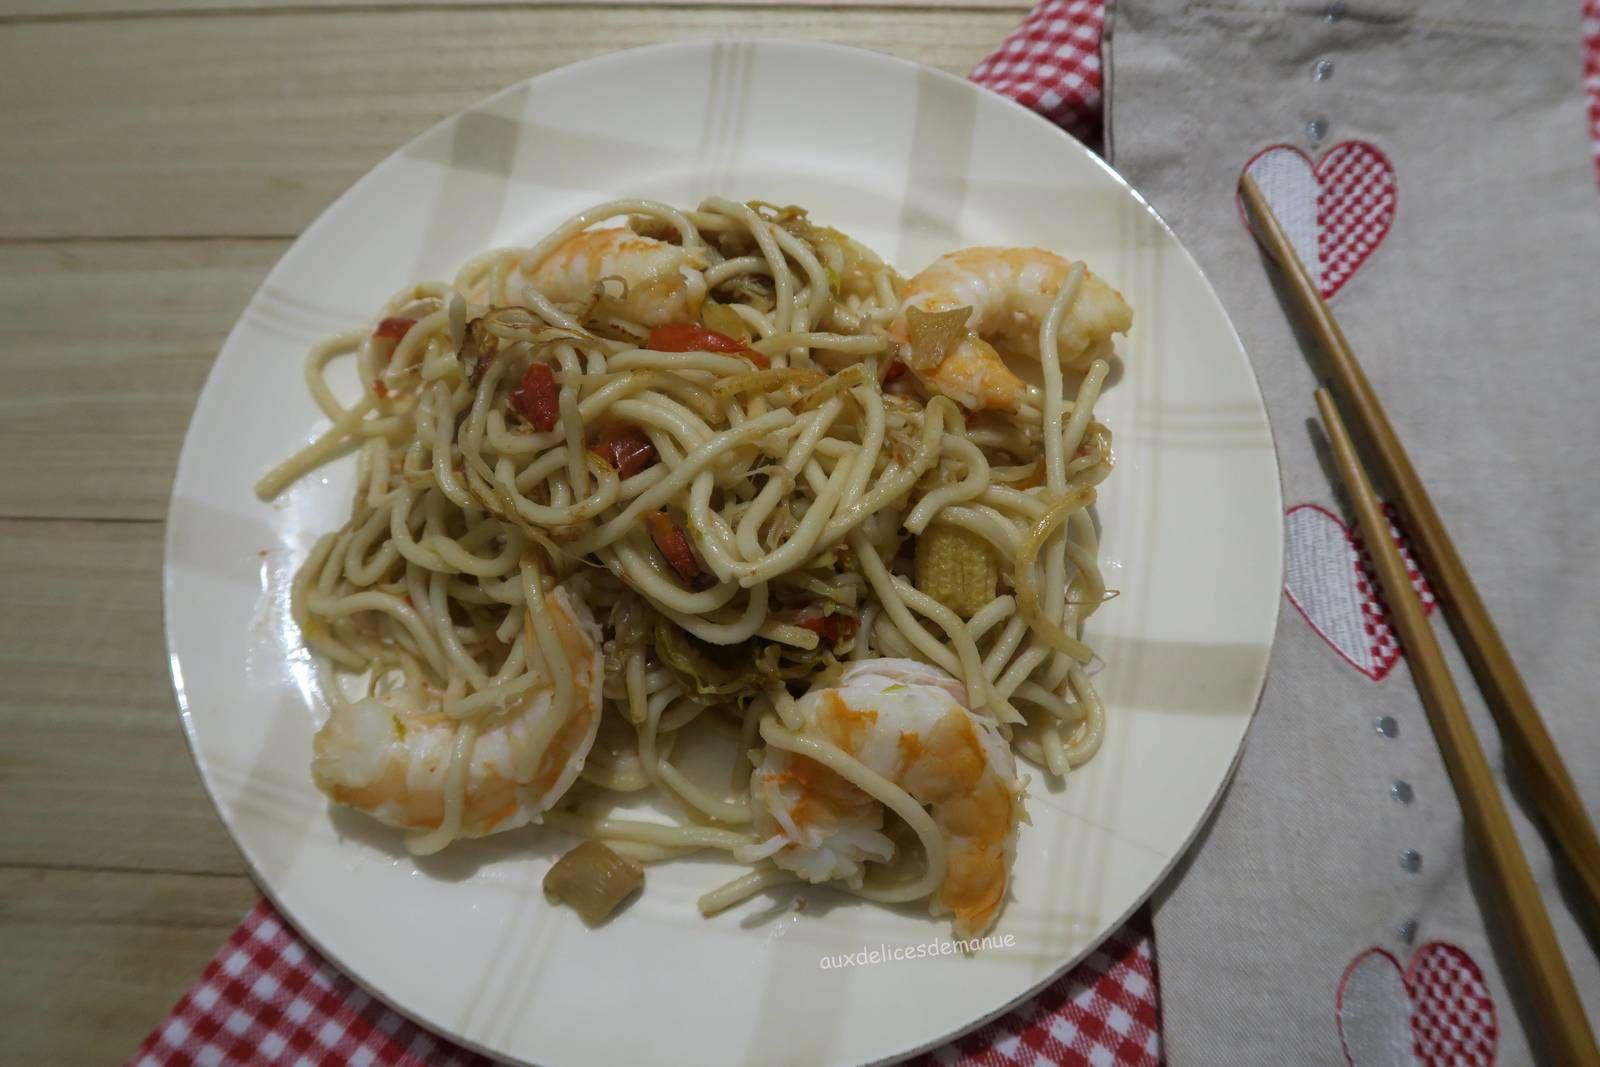 nouilles,crevettes,nouilles chinoises,yakitori